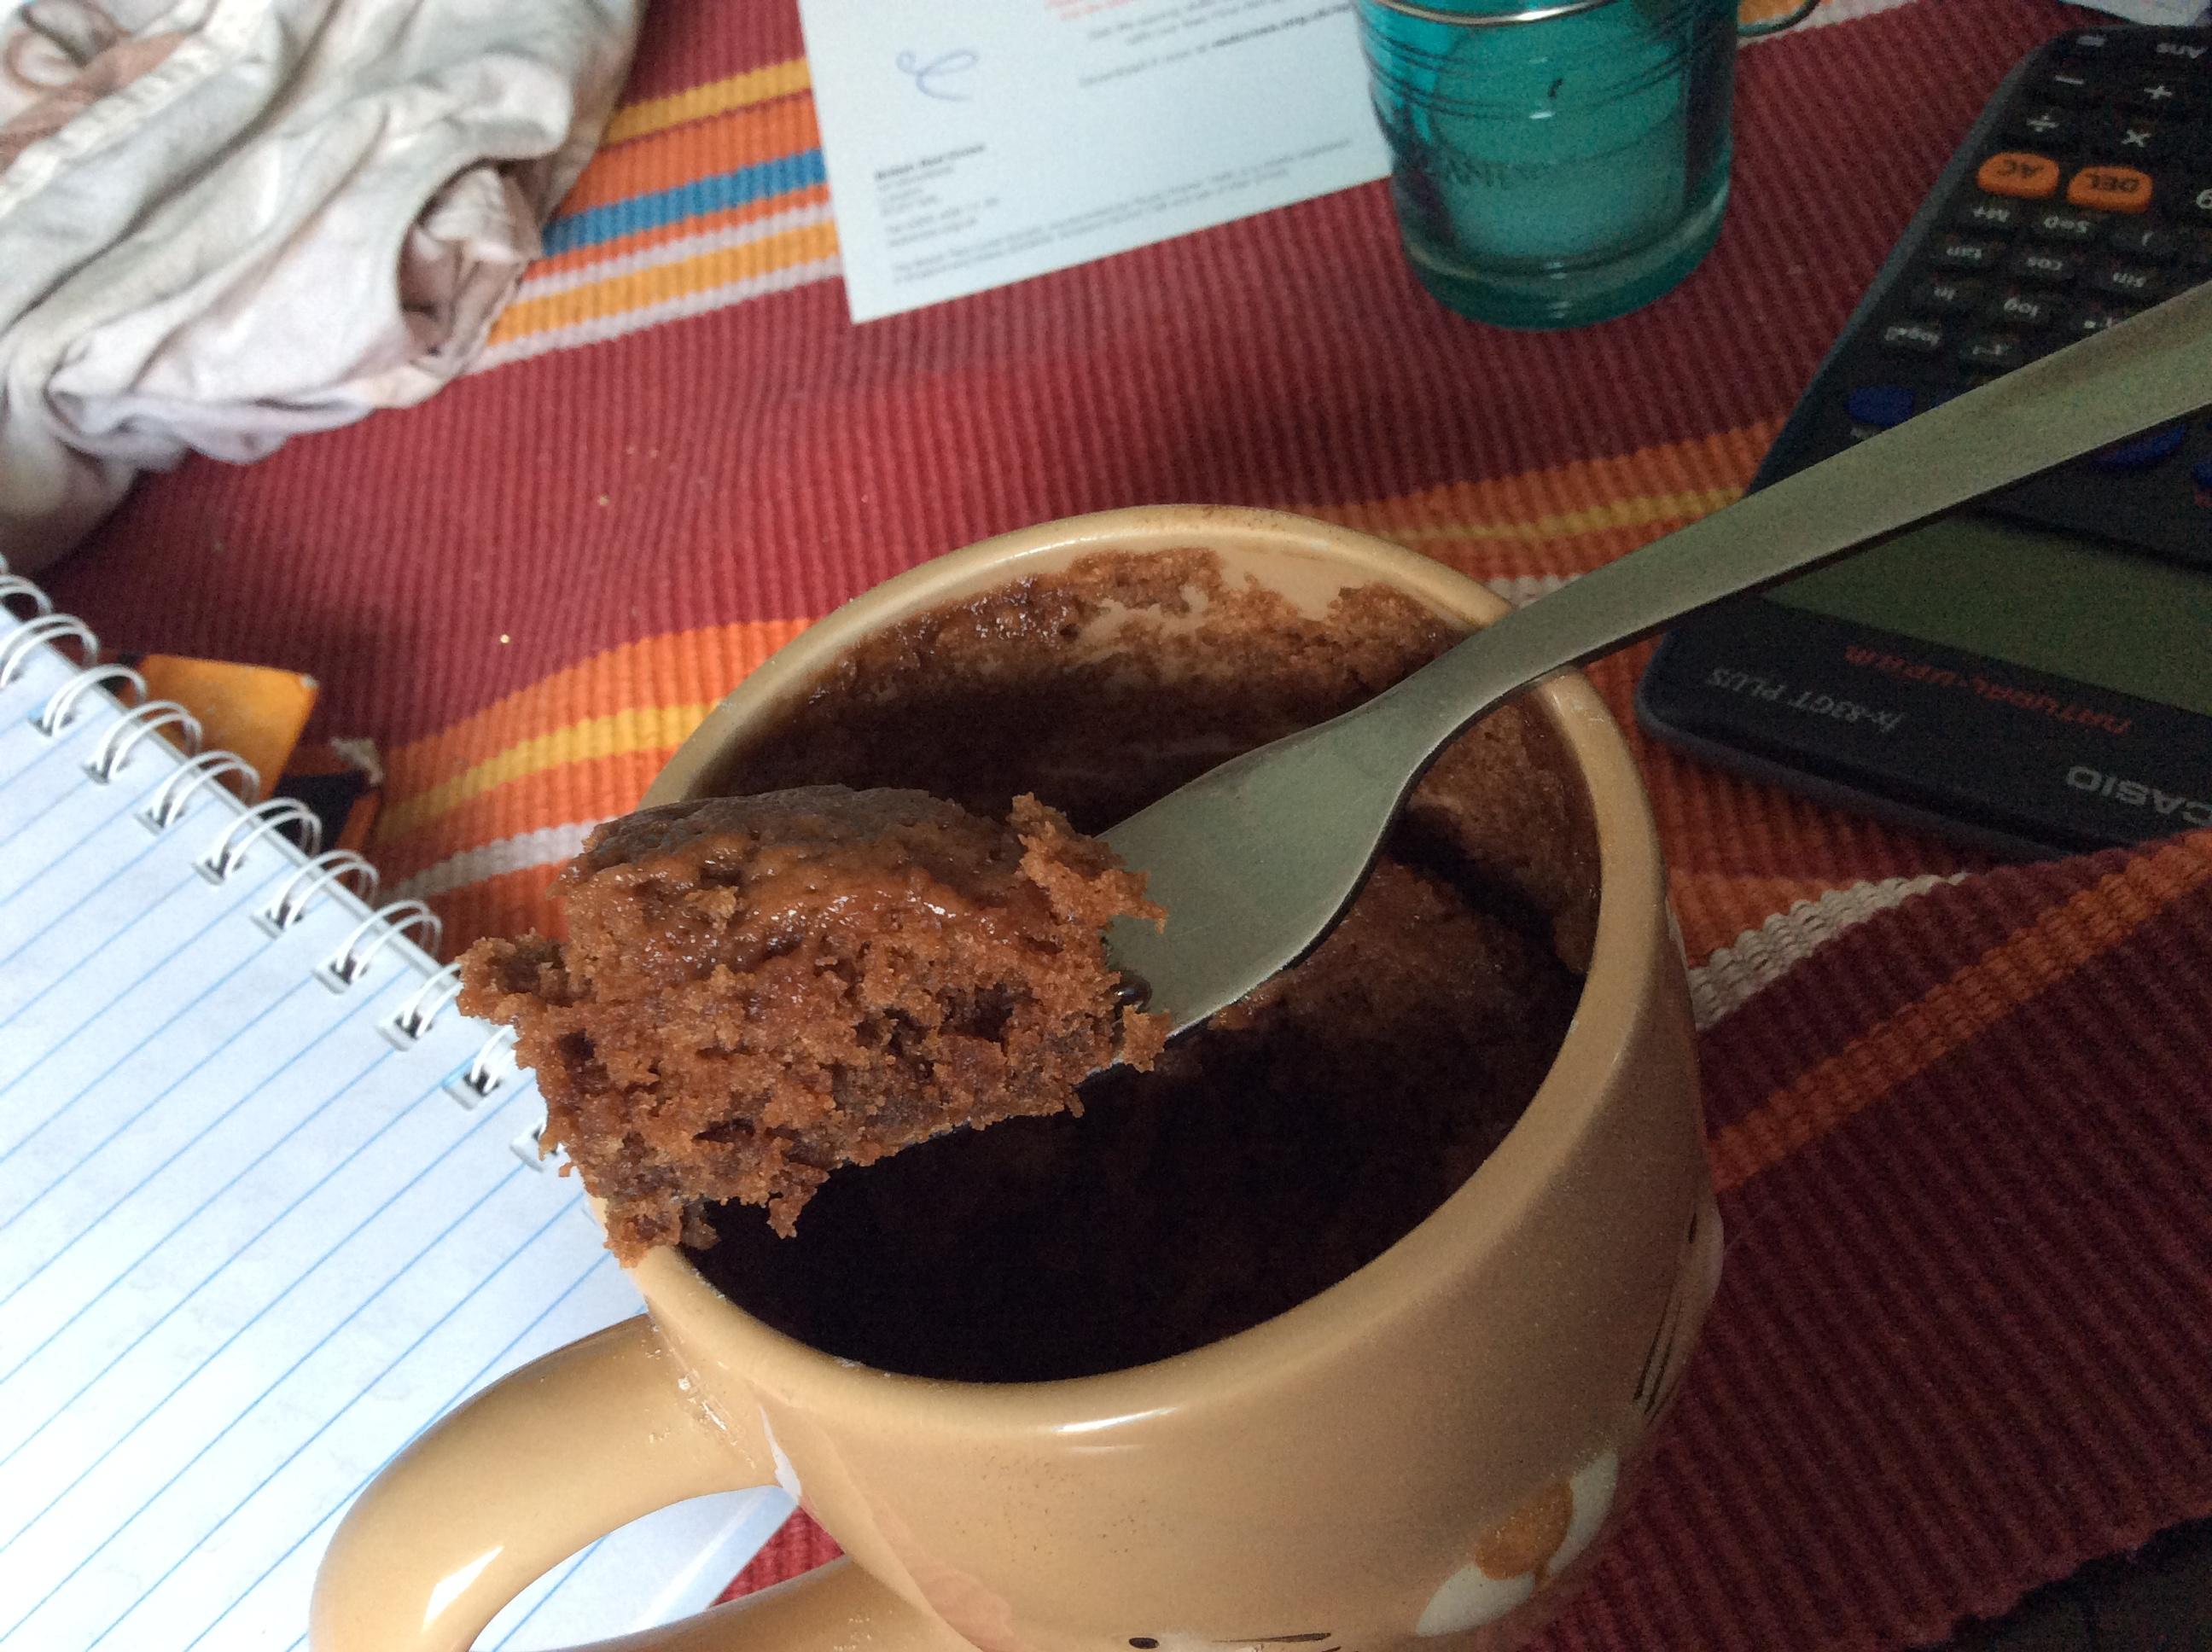 Chocolate Mug Cake - No Egg! - A chocolate mug cake tha